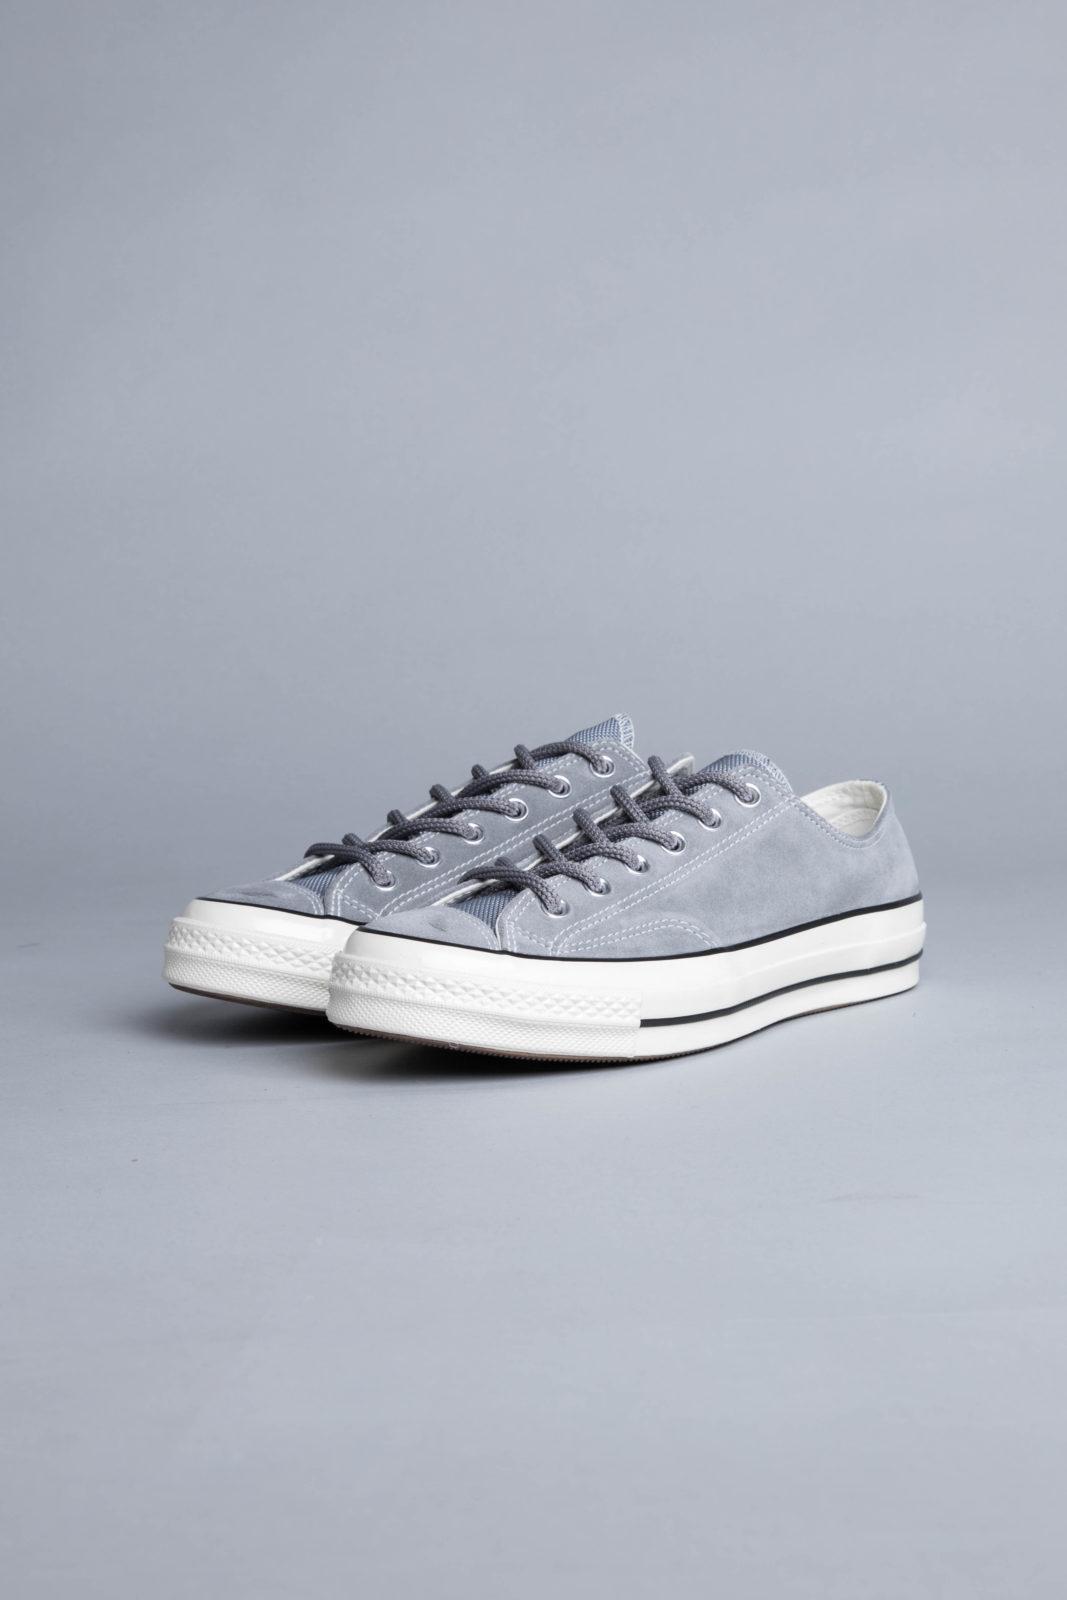 converse base camp Shop Clothing & Shoes Online